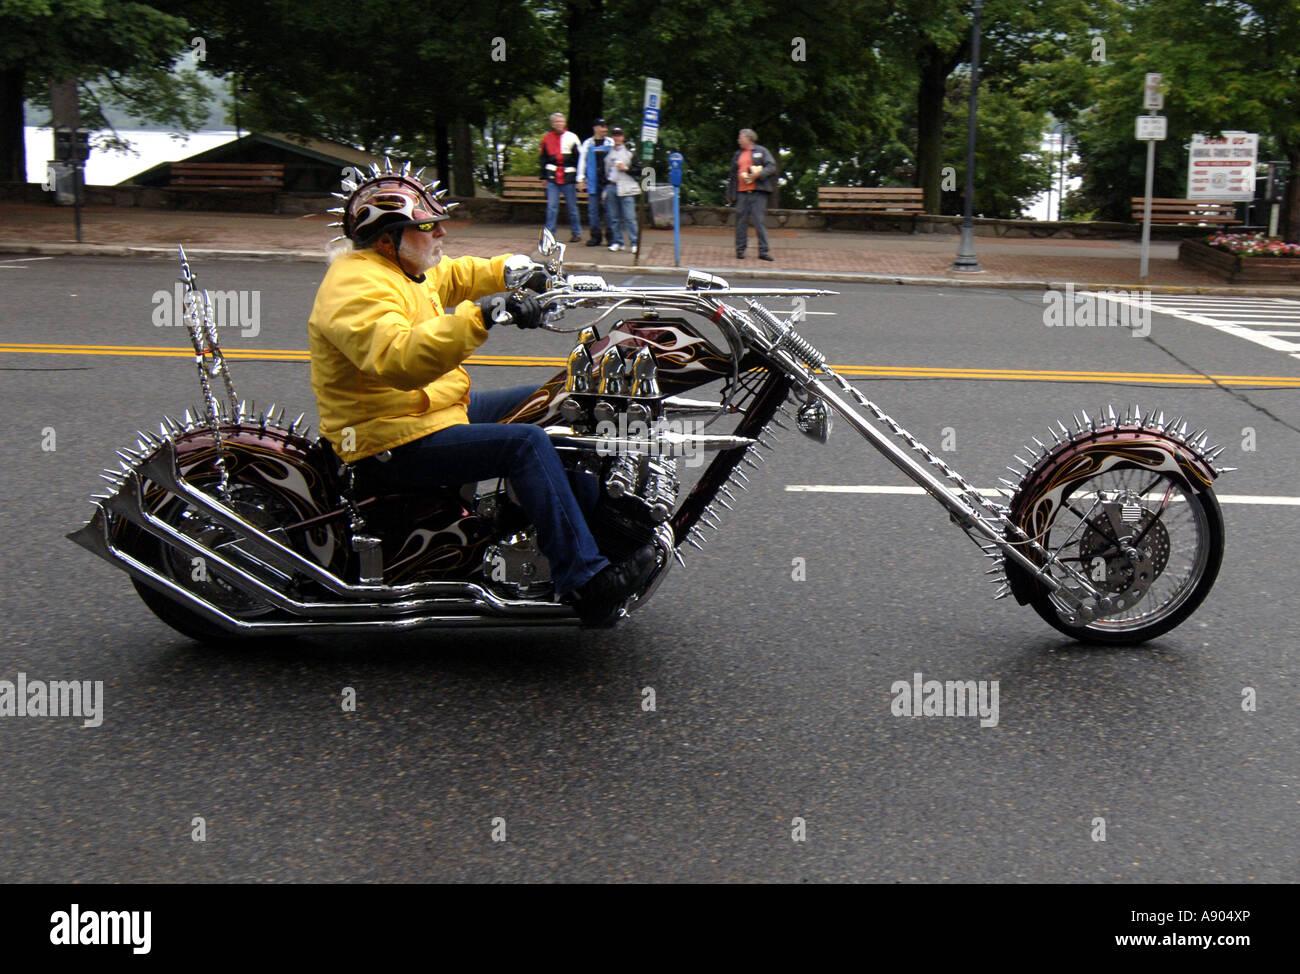 Lake George, NY. Americade Bike rally. Scott Ellis cruises Main Street on his custom chopper made from Honda 1981 - Stock Image